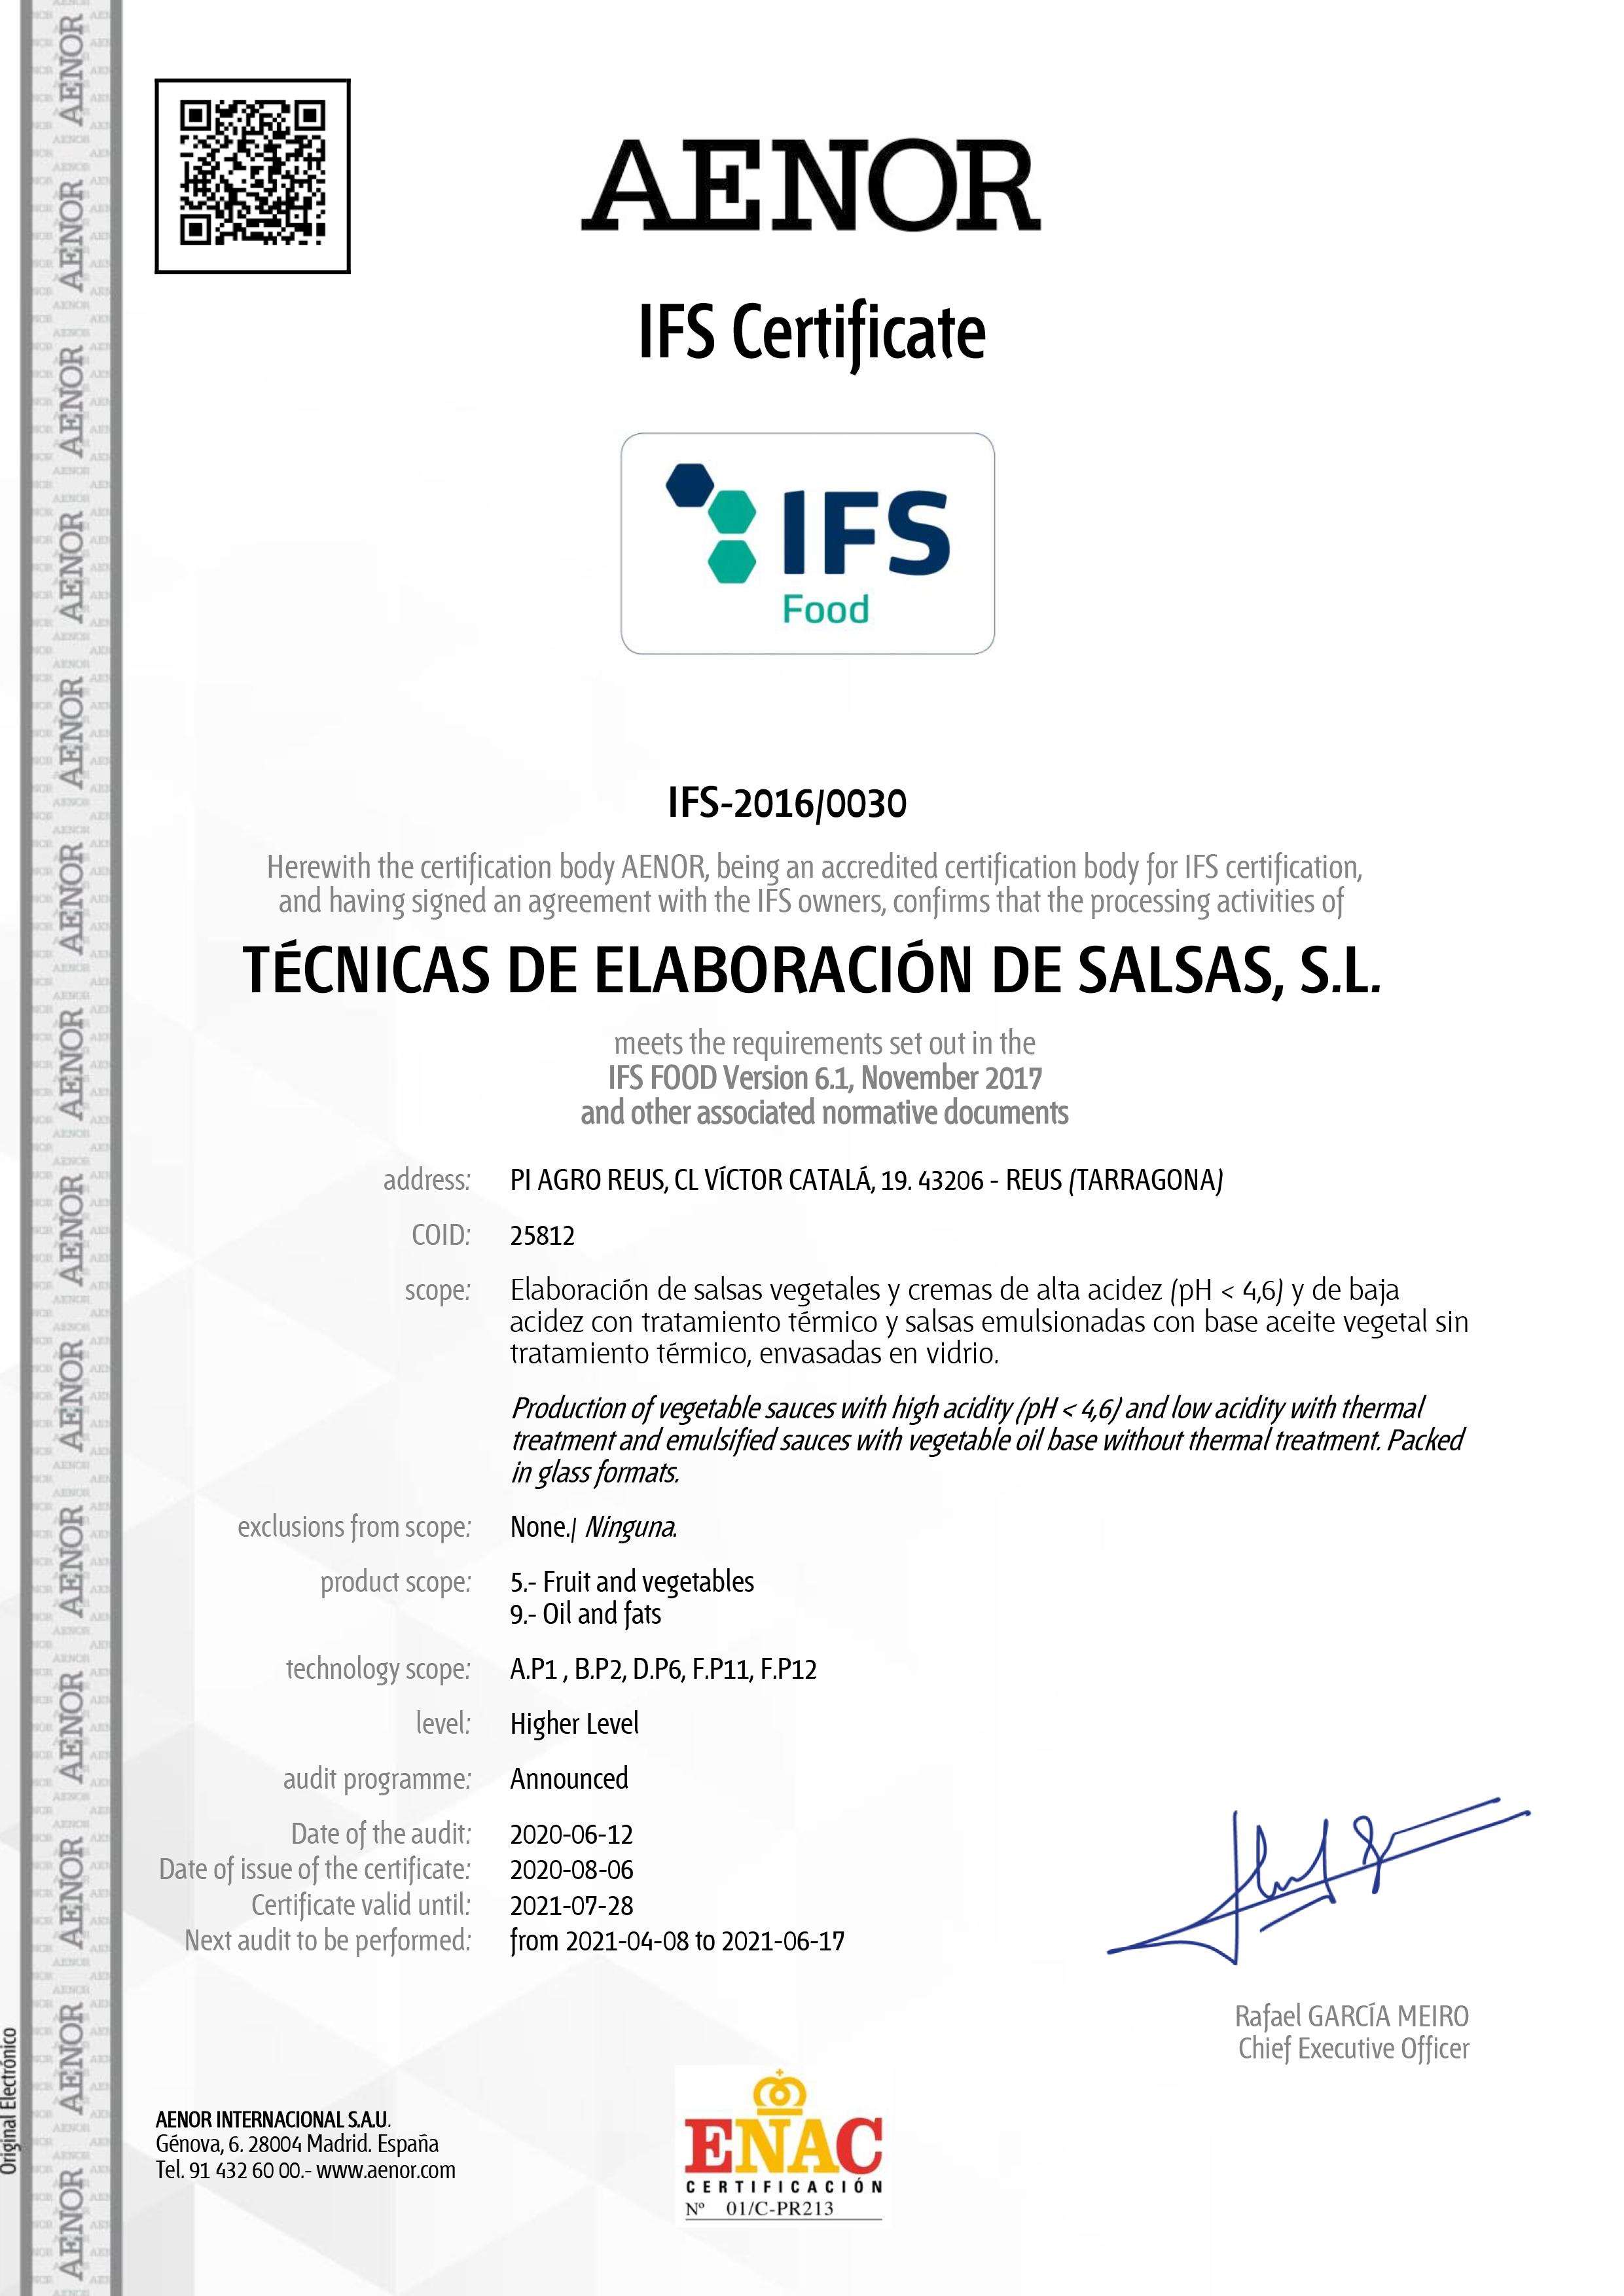 Certificado IFS - 2020 - 2021